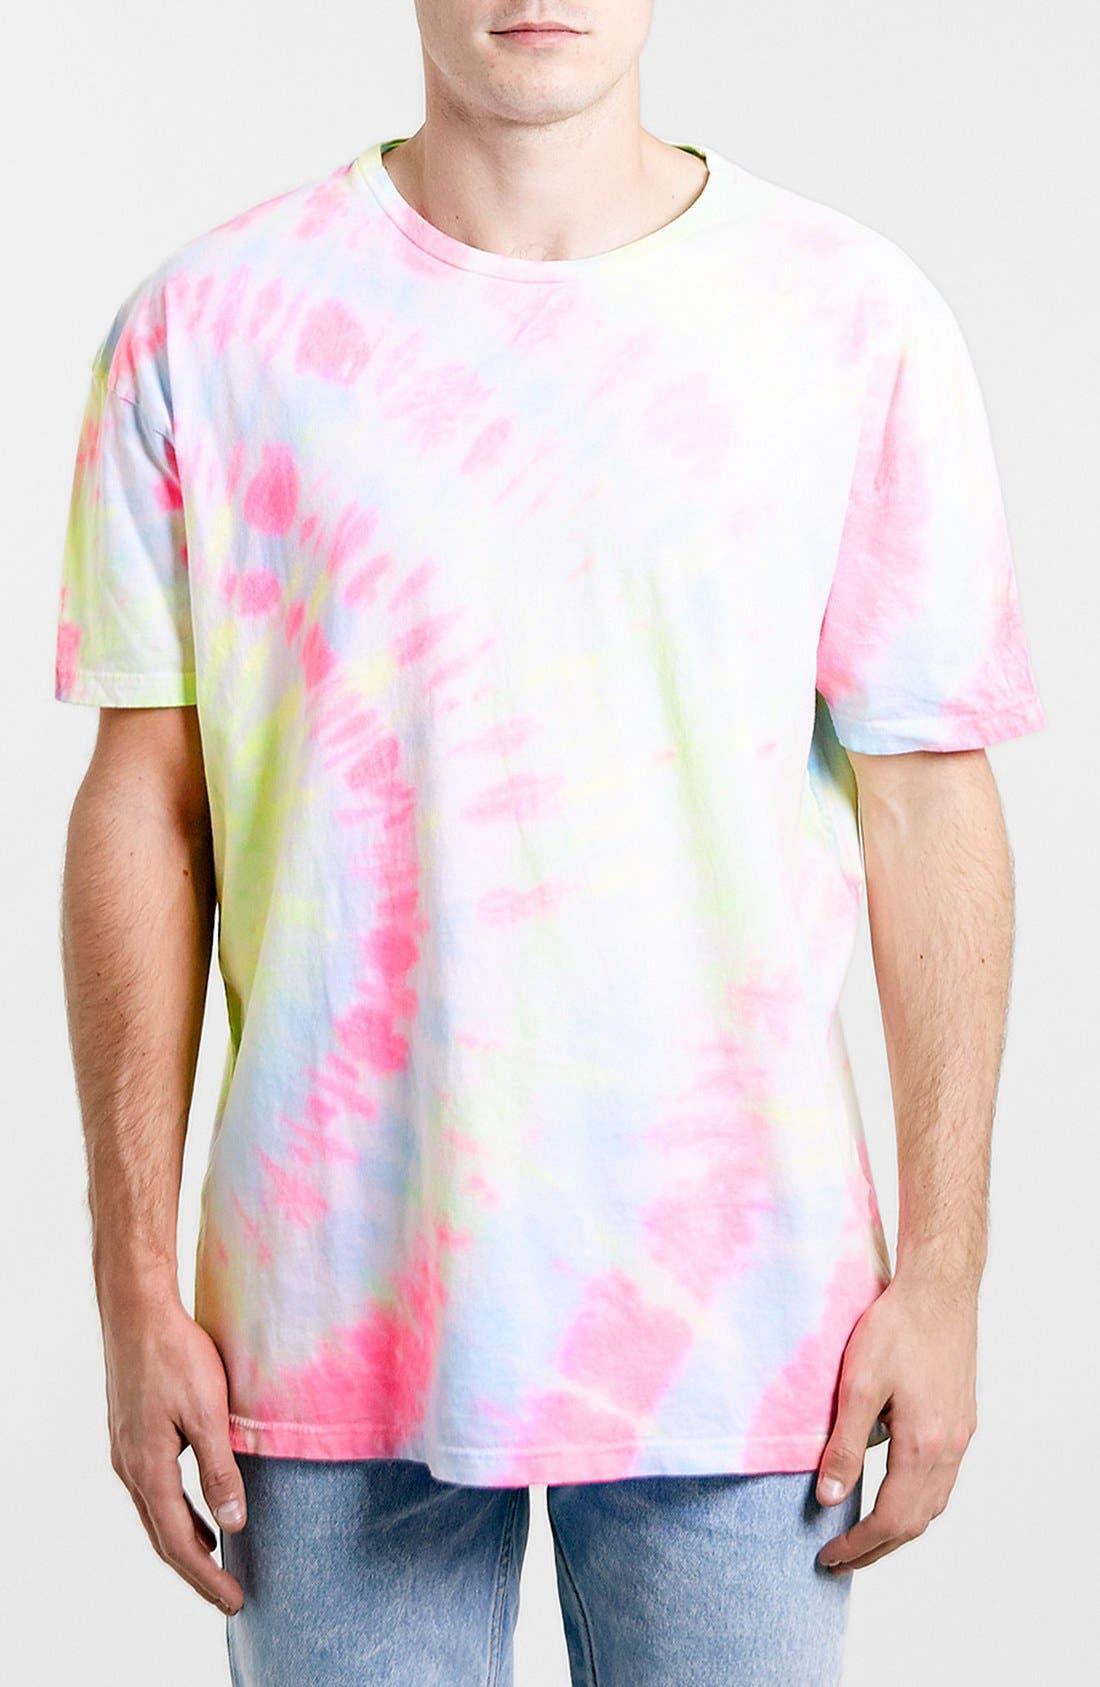 Alternate Image 1 Selected - Topman 'Skater Cali' Oversized Neon Tie-Dye Cotton T-Shirt